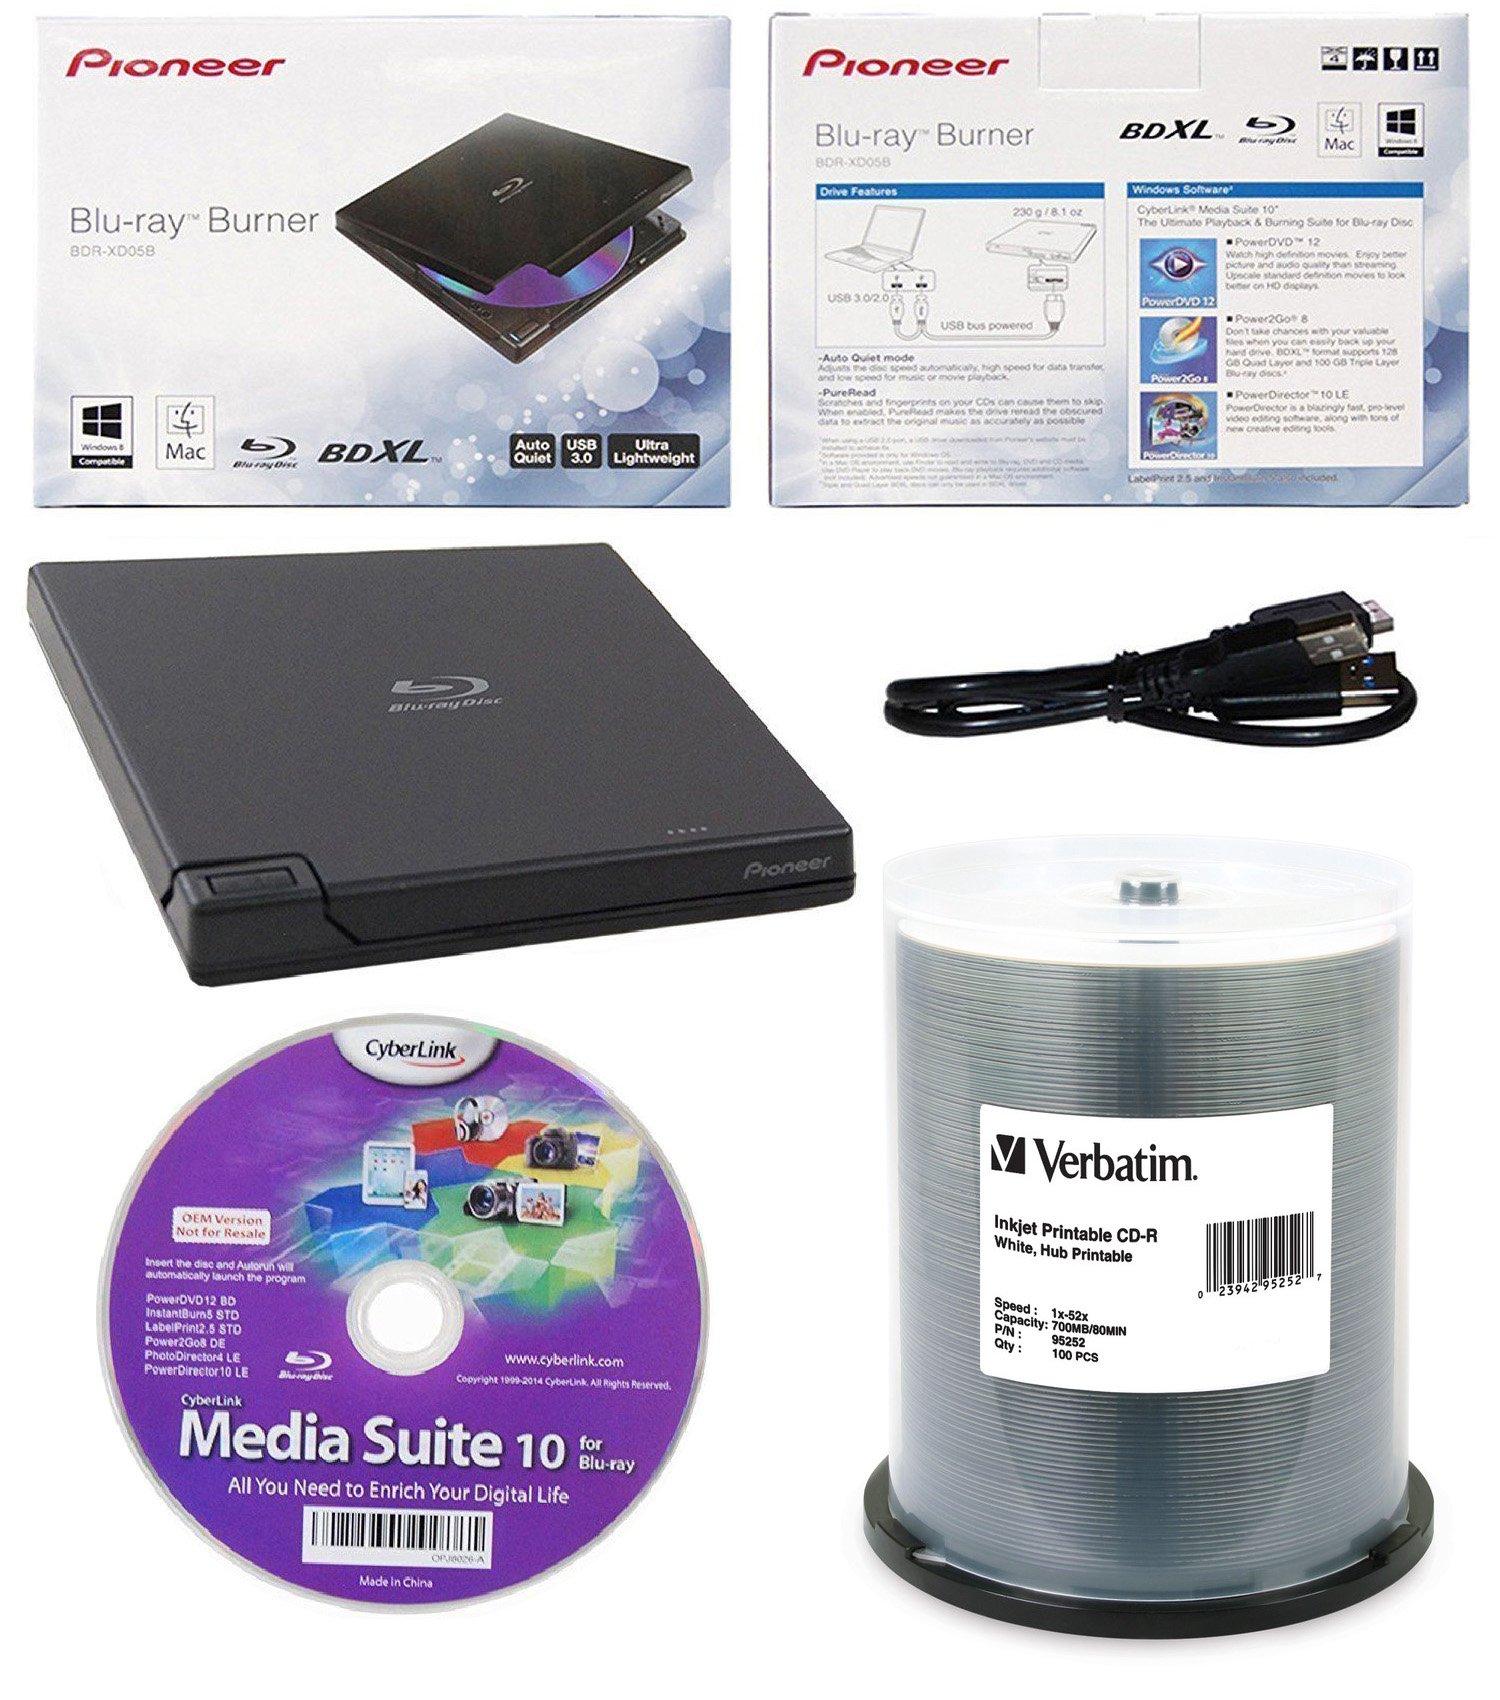 Pioneer 6x BDR-XD05B Ultra Lightweight External Blu-ray BDXL Burner, Cyberlink Software and USB Cable Bundle with 100pk CD-R Verbatim 700MB 52X DataLifePlus White Inkjet, Hub Printable